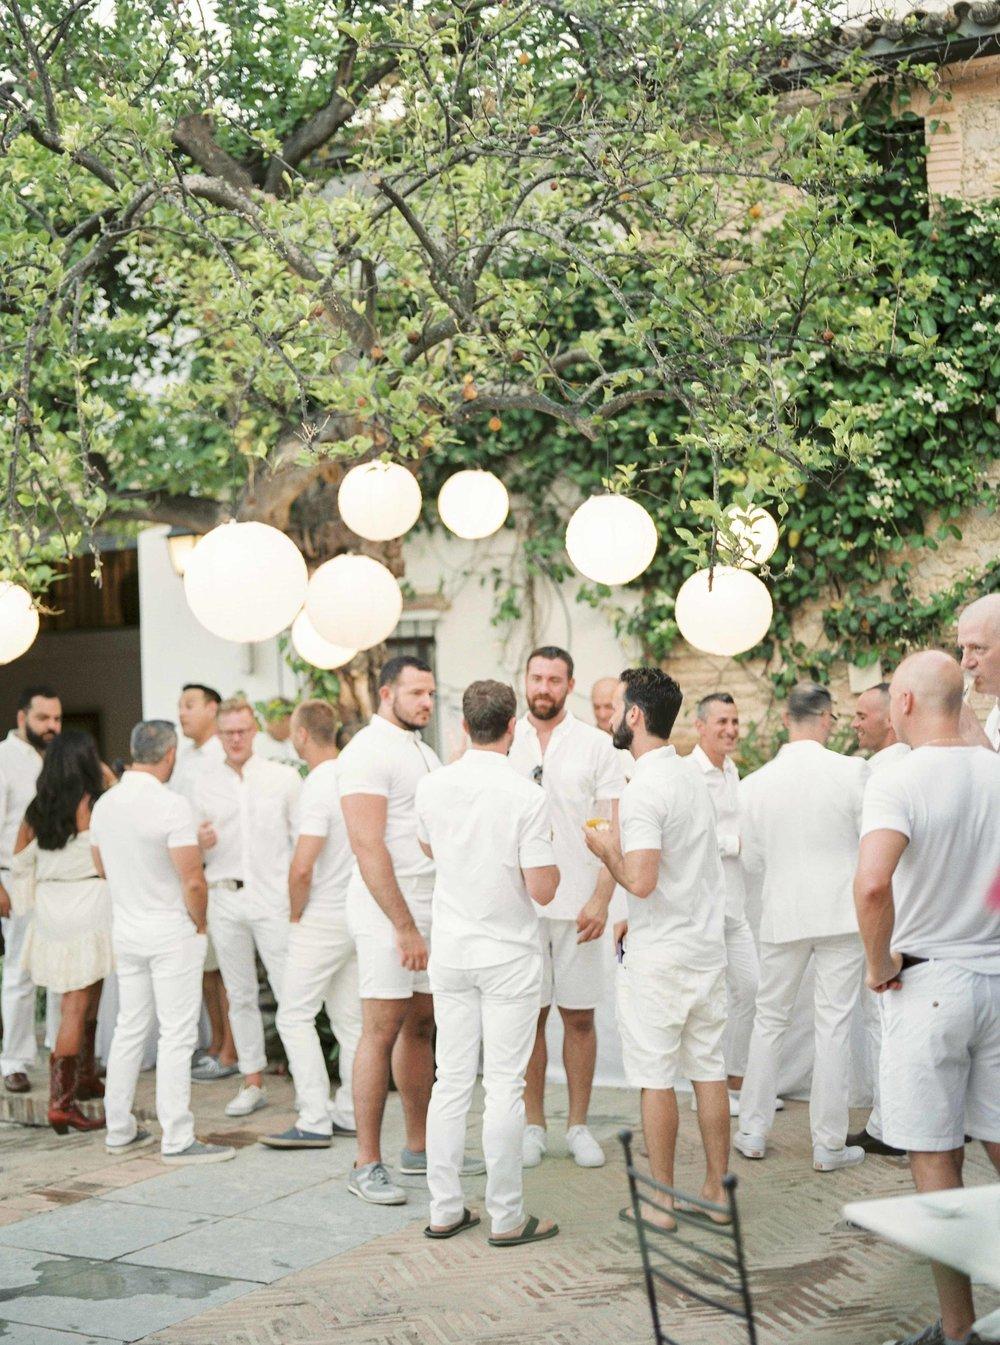 Mireia Cardomí_Gay Wedding-28.jpg